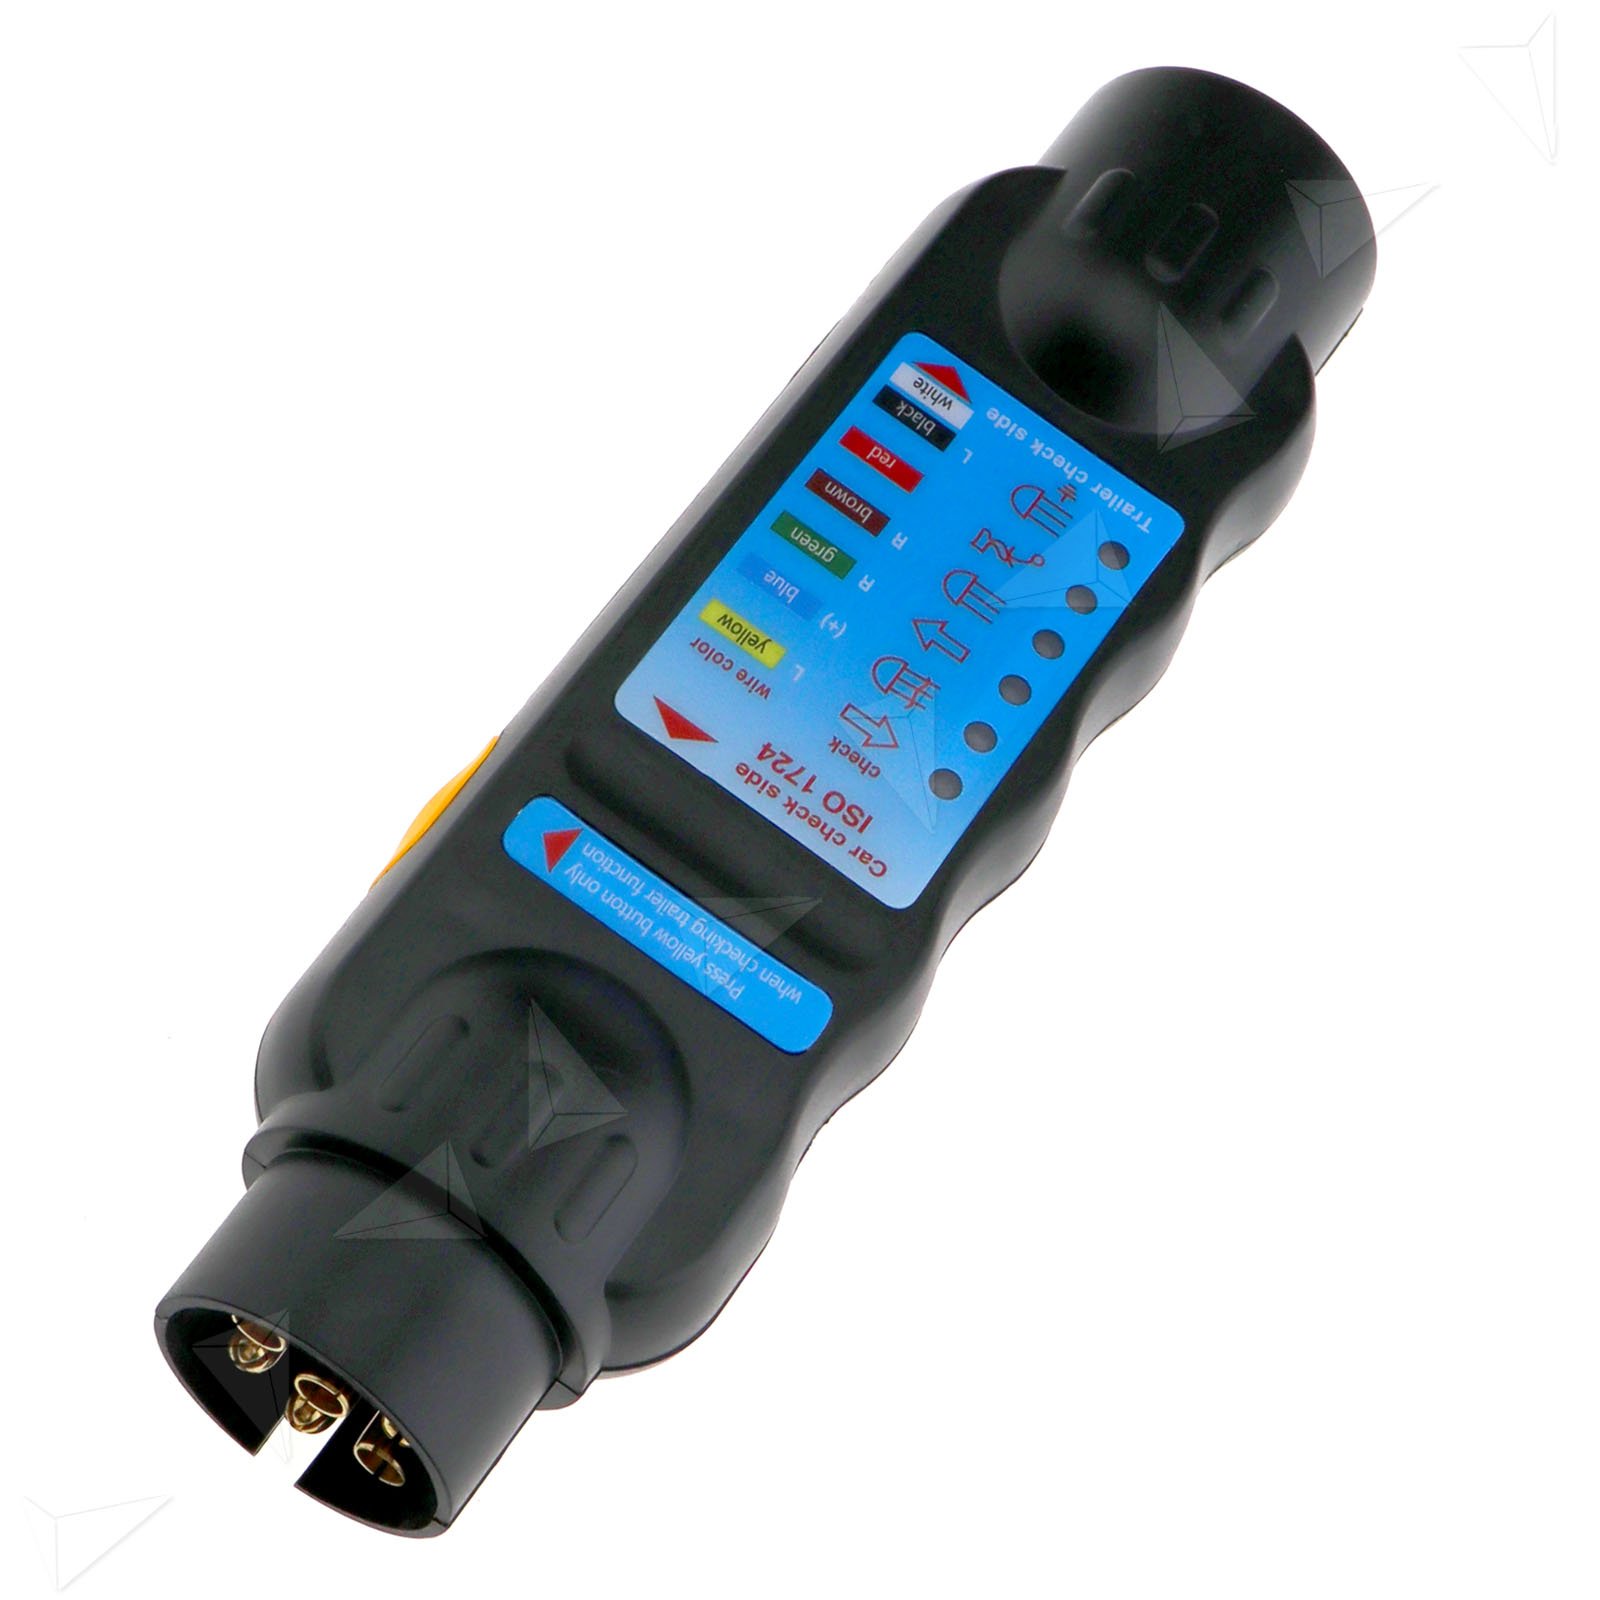 Towing Trailer 7 Pin Tow Bar Caravan Light Wiring Circuit Tester ...